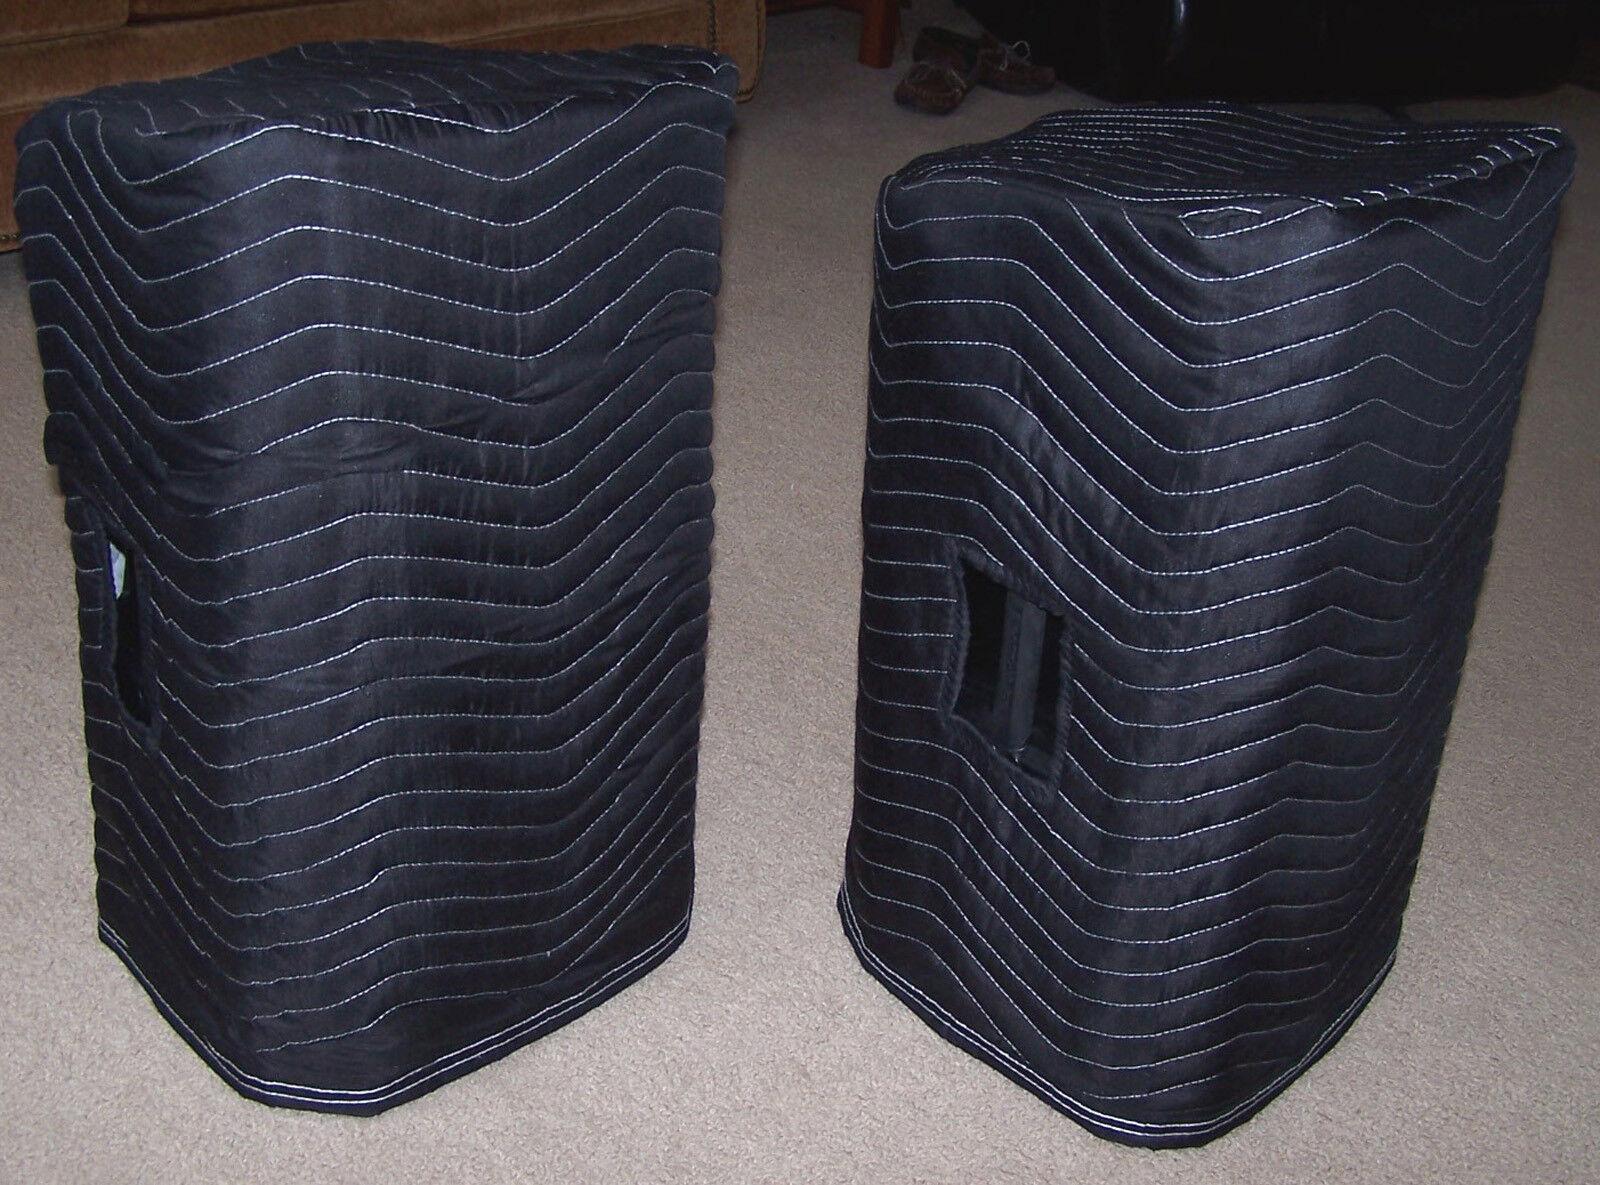 EV ZLX-12P ZLX 12P Premium Padded schwarz Speaker Covers (2) Qty of 1 = 1 Pair